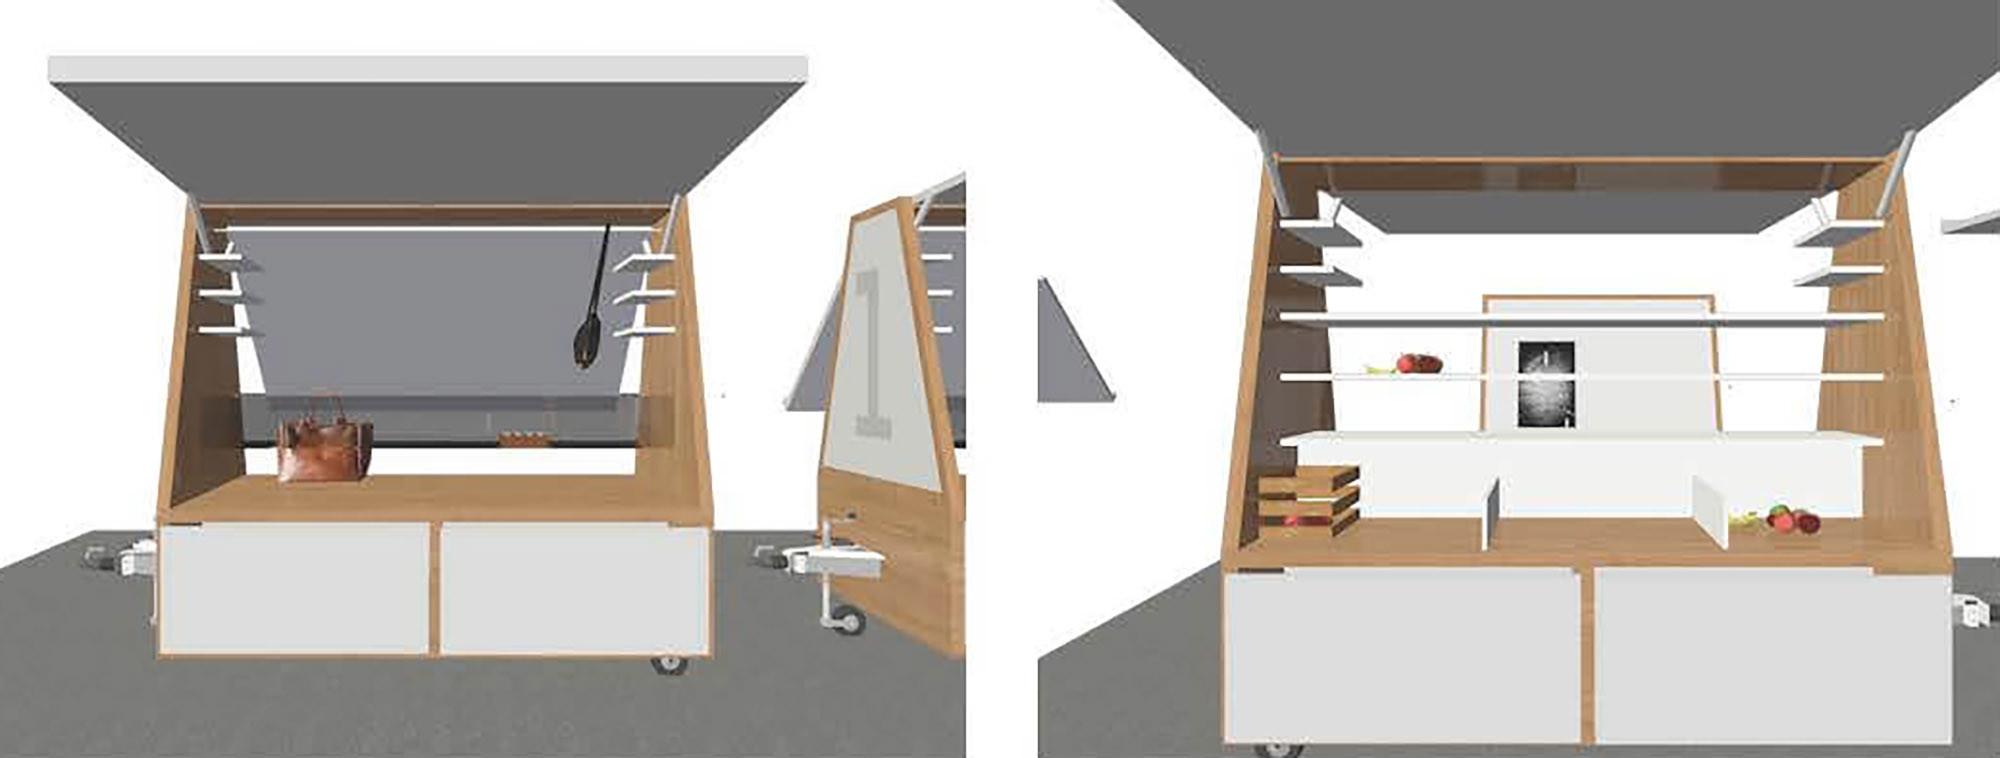 monti-stall-2-proposal